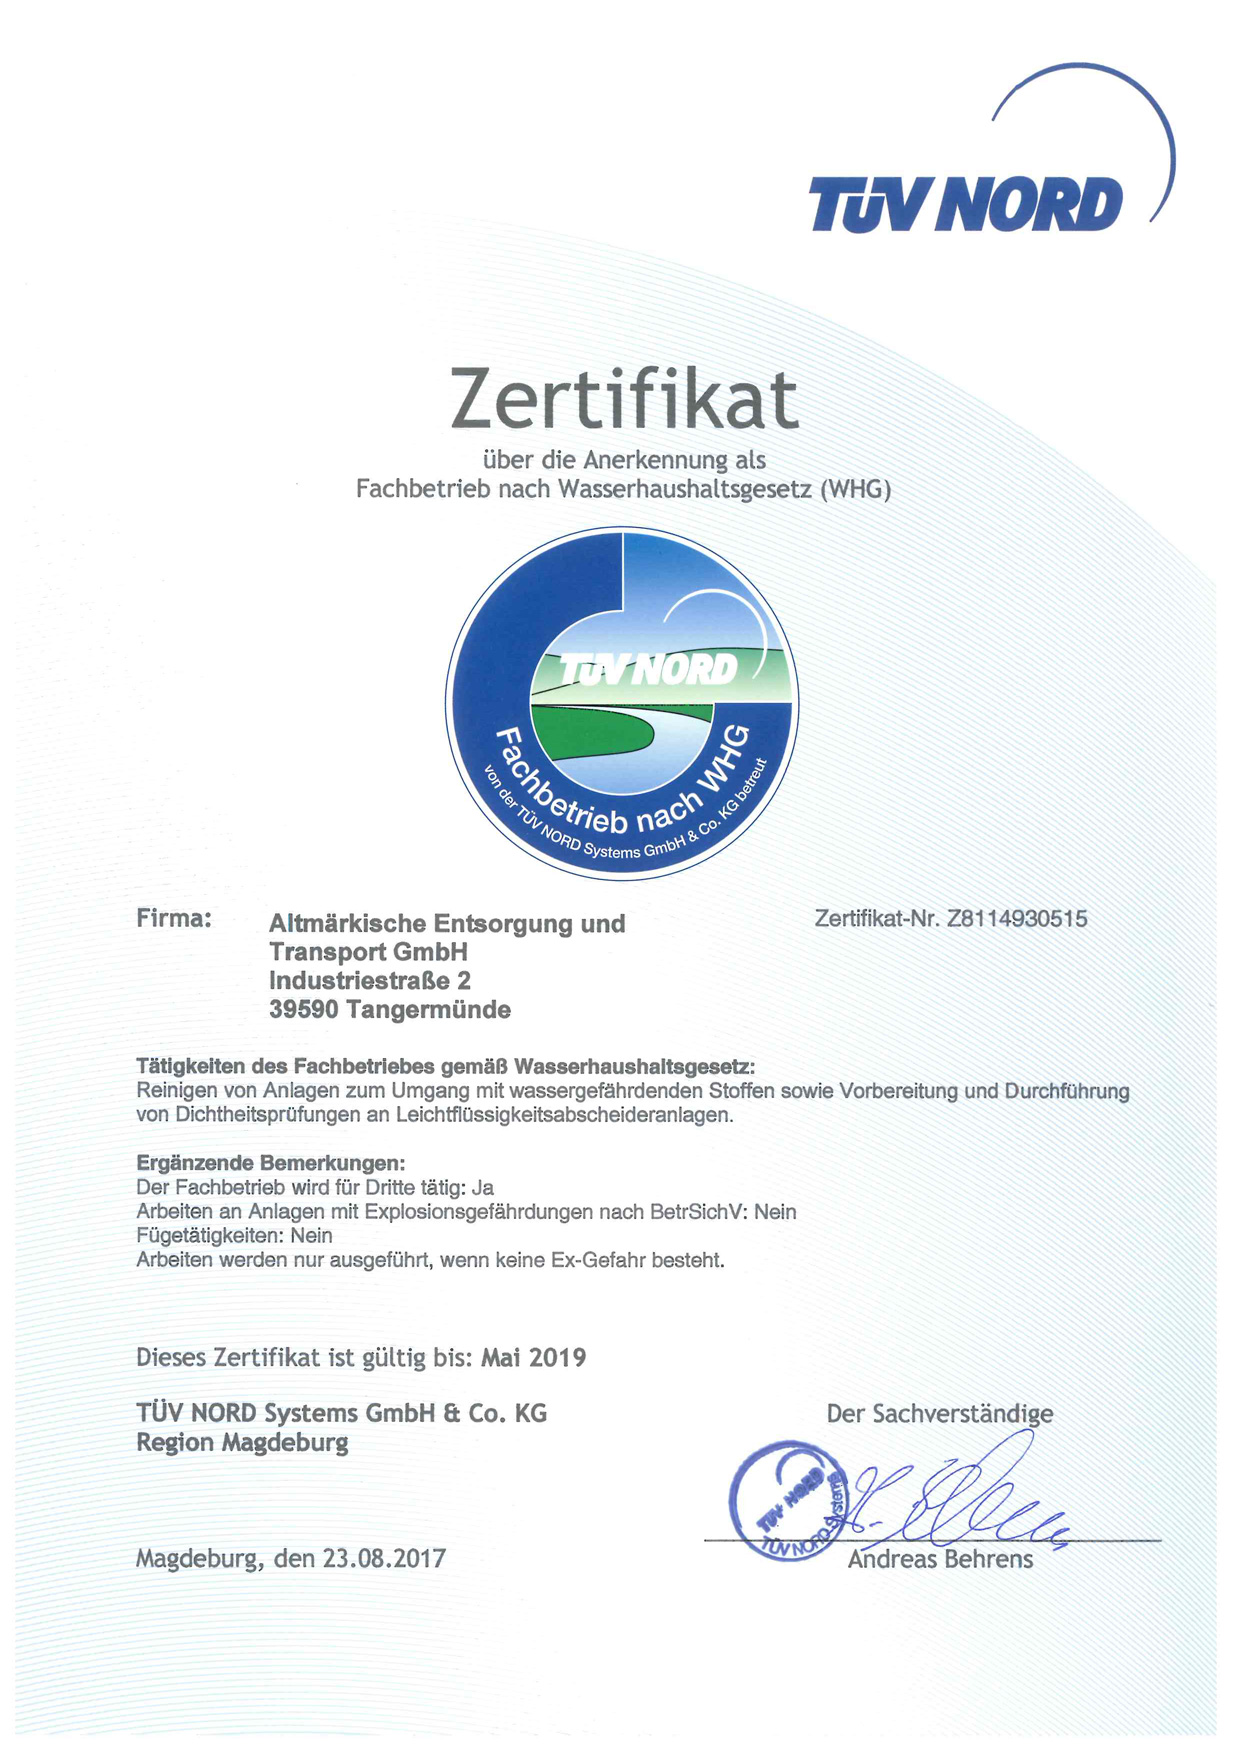 aet-whg-zertifikat